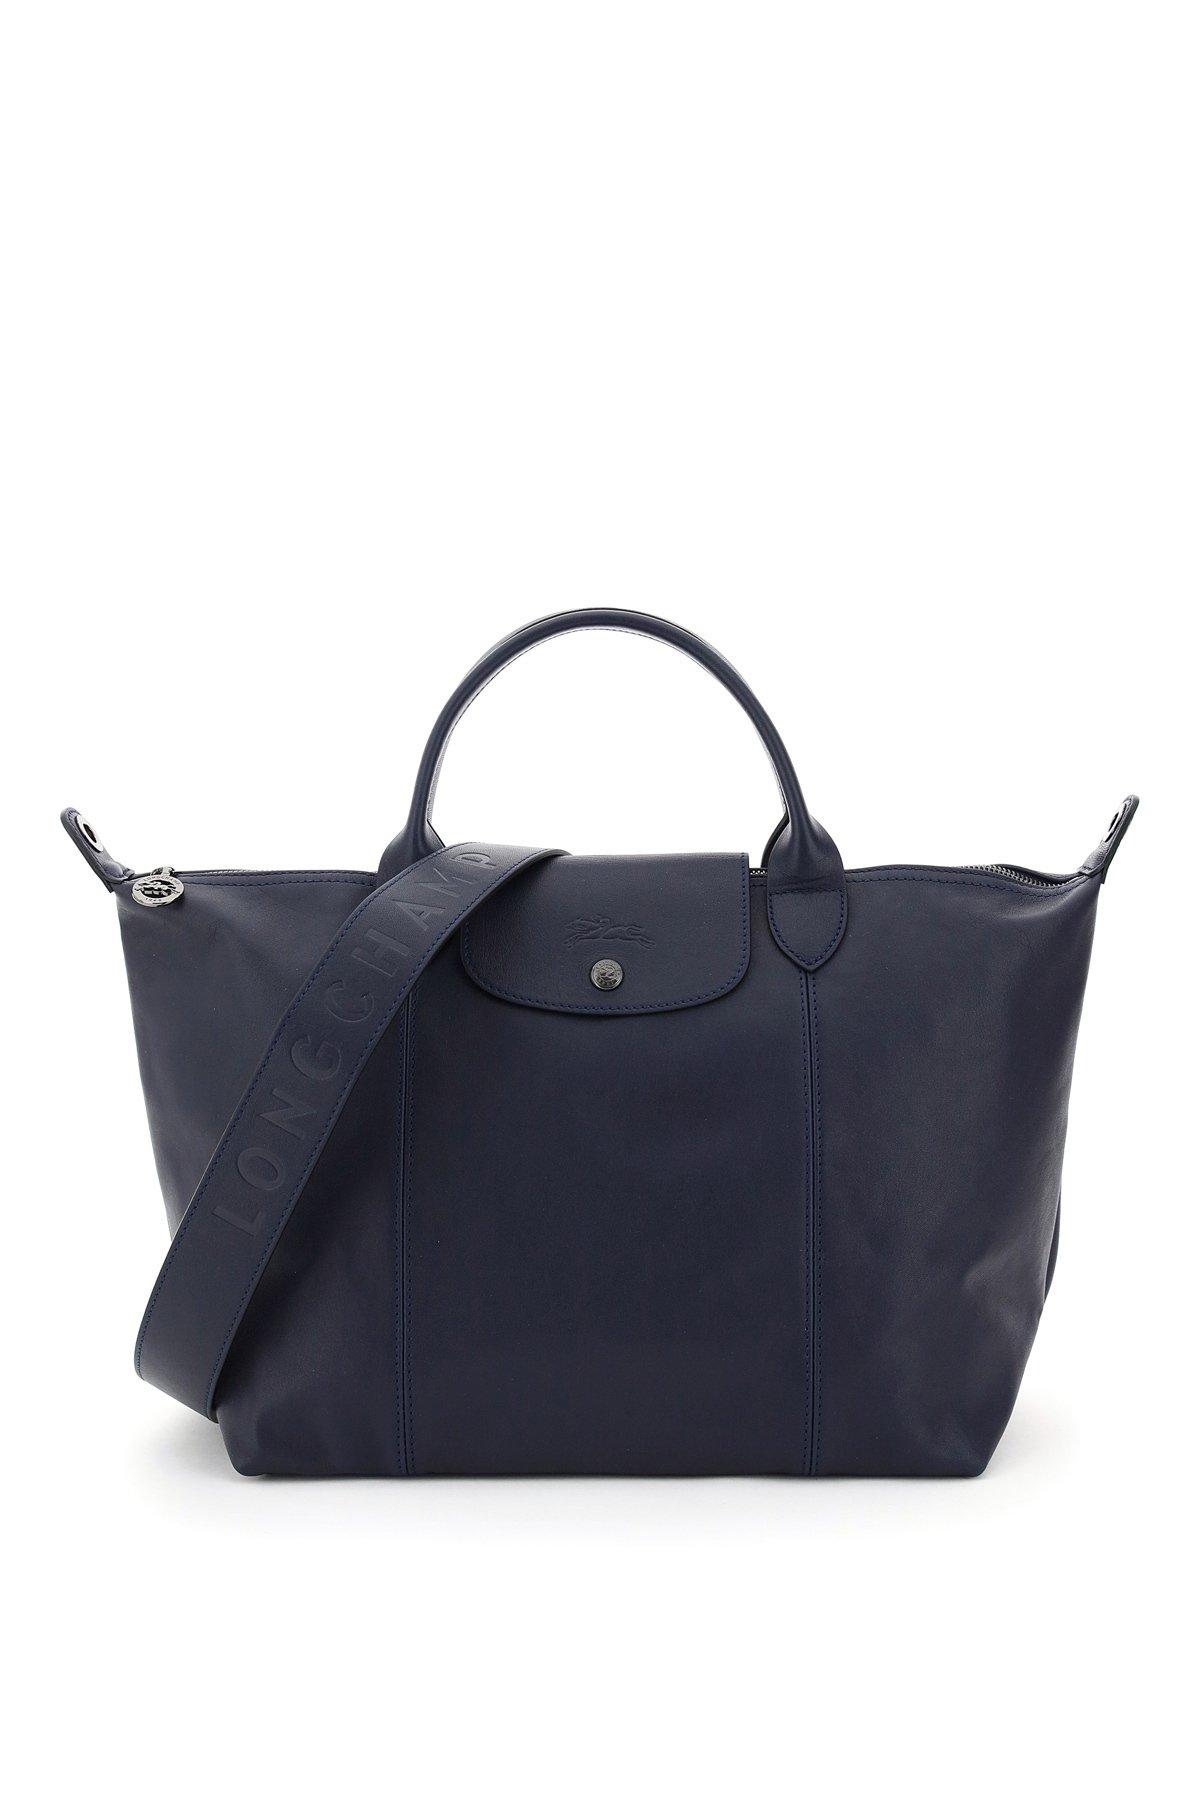 Longchamp borsa a mano le pliage cuir medium